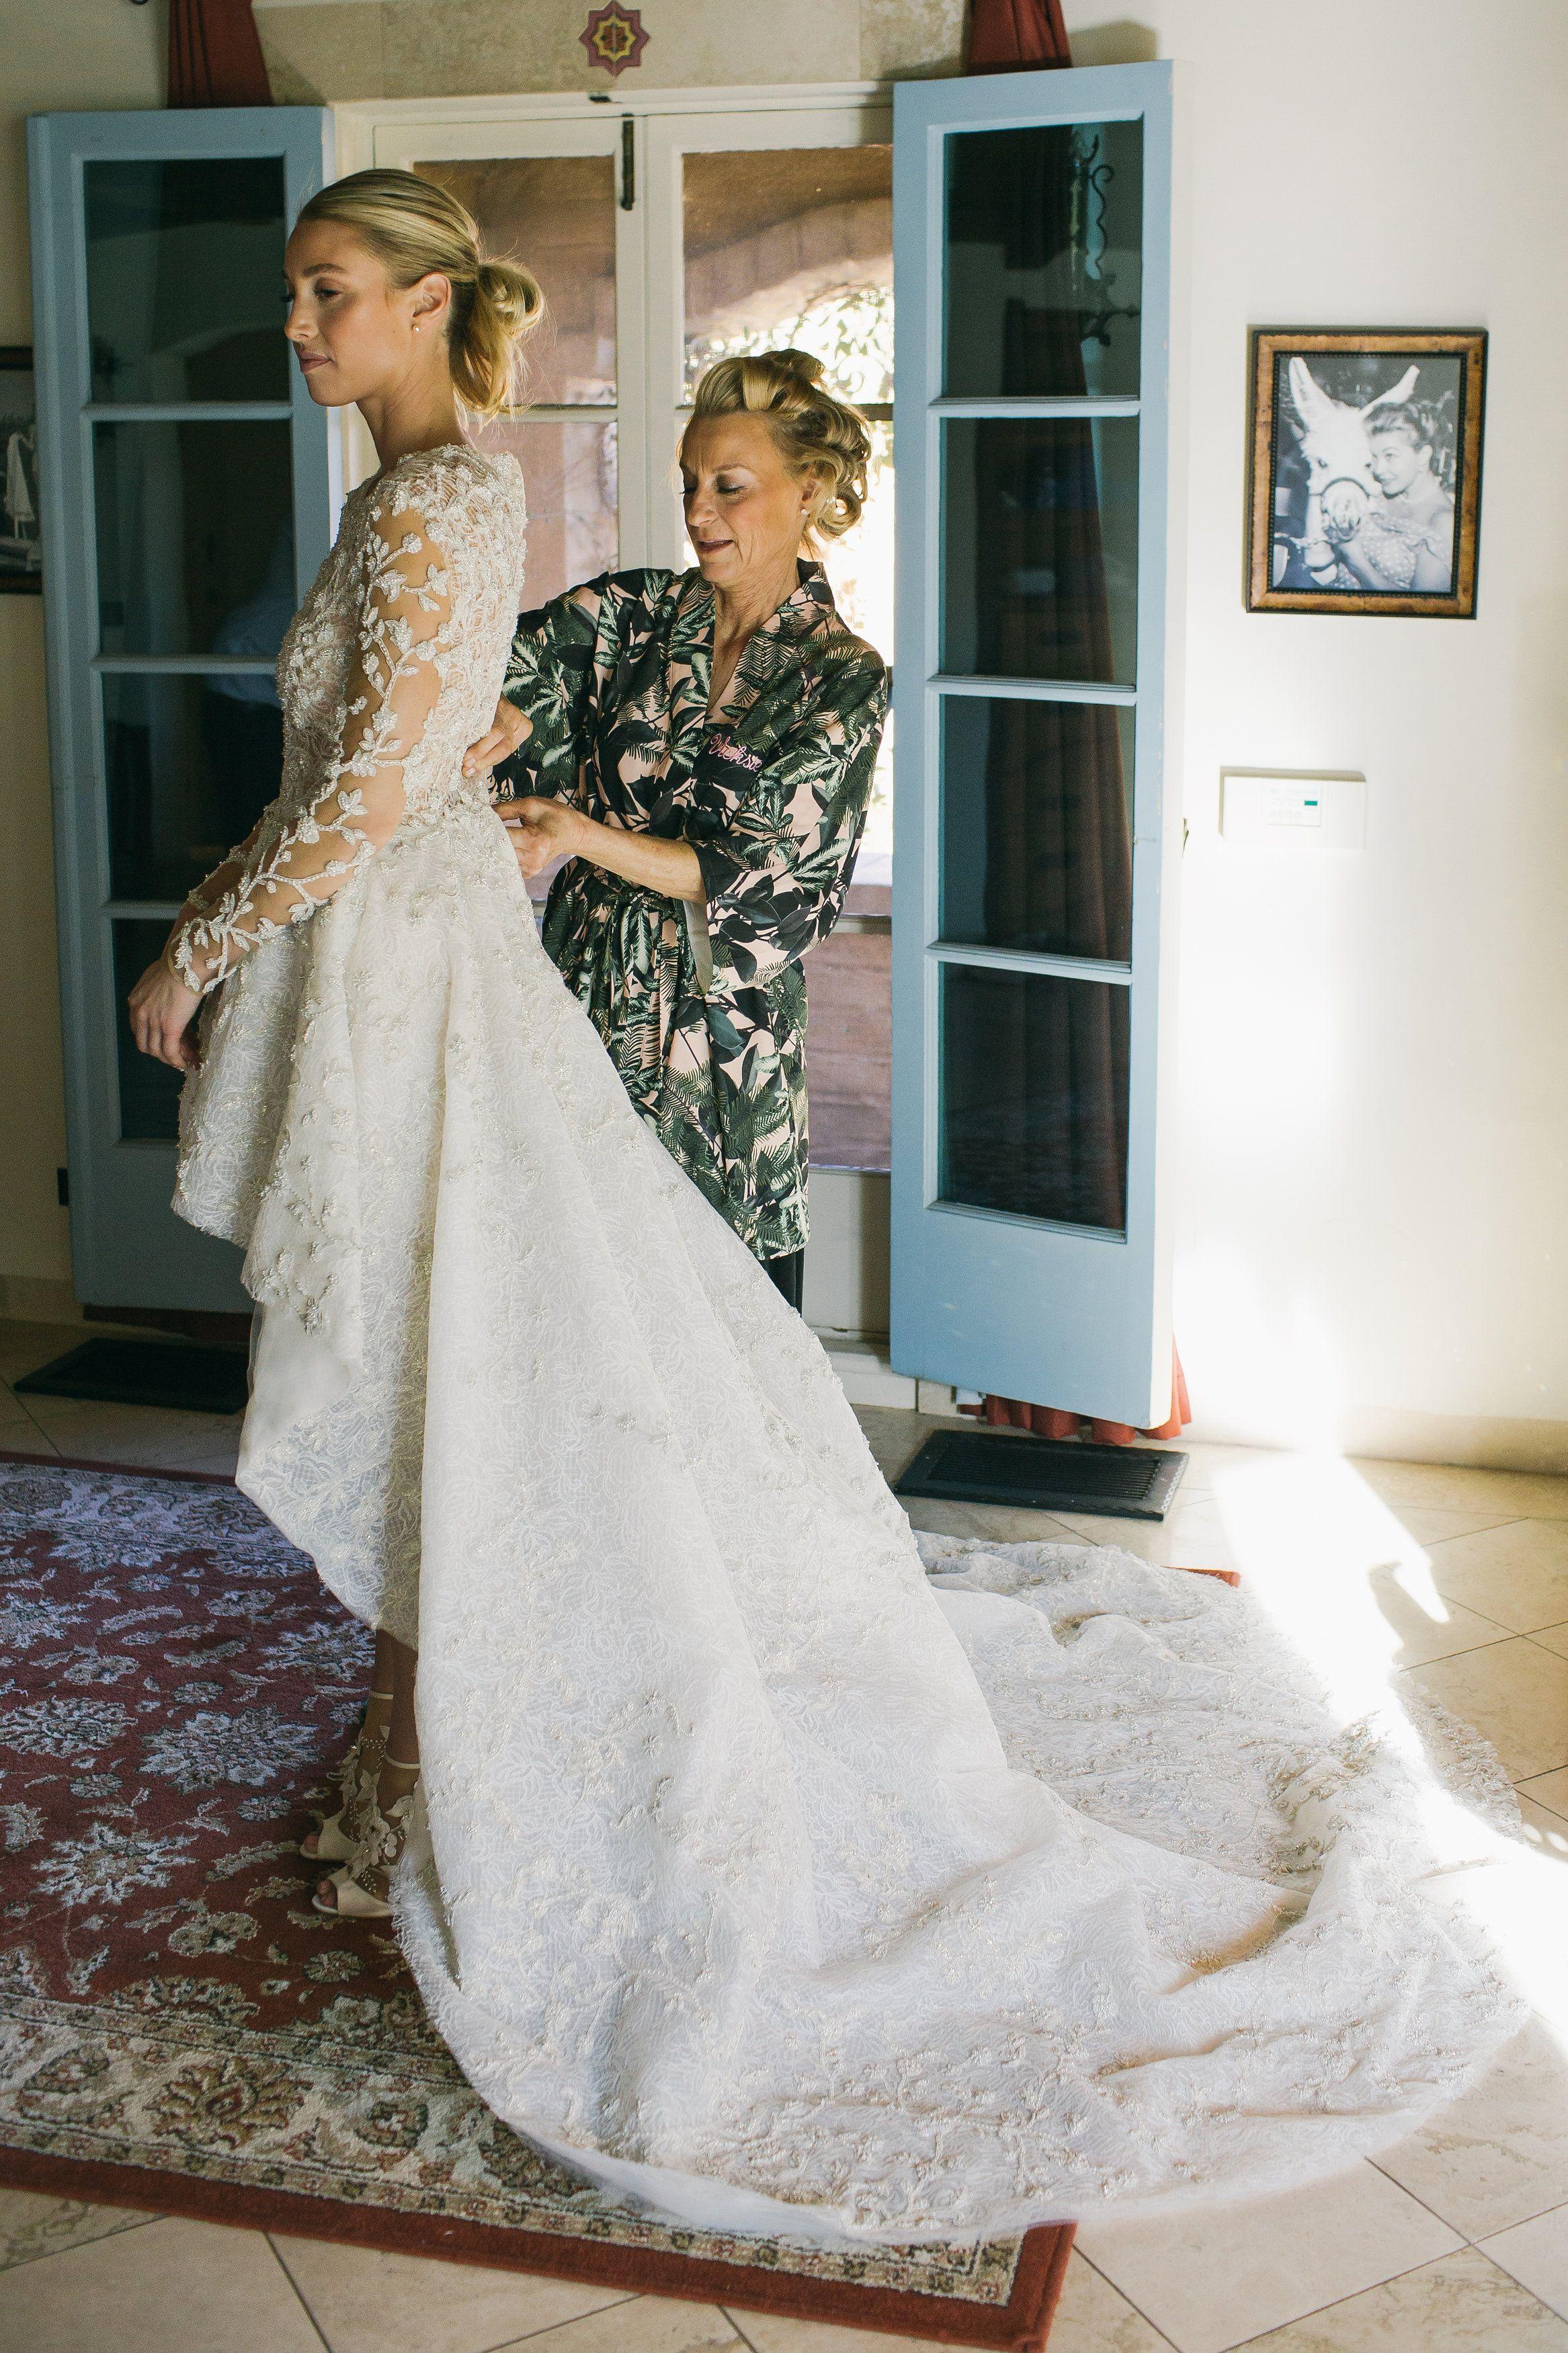 My Wedding Dress Whitney Port Shapewear For Wedding Dress Whitney Port Wedding Wedding Dresses